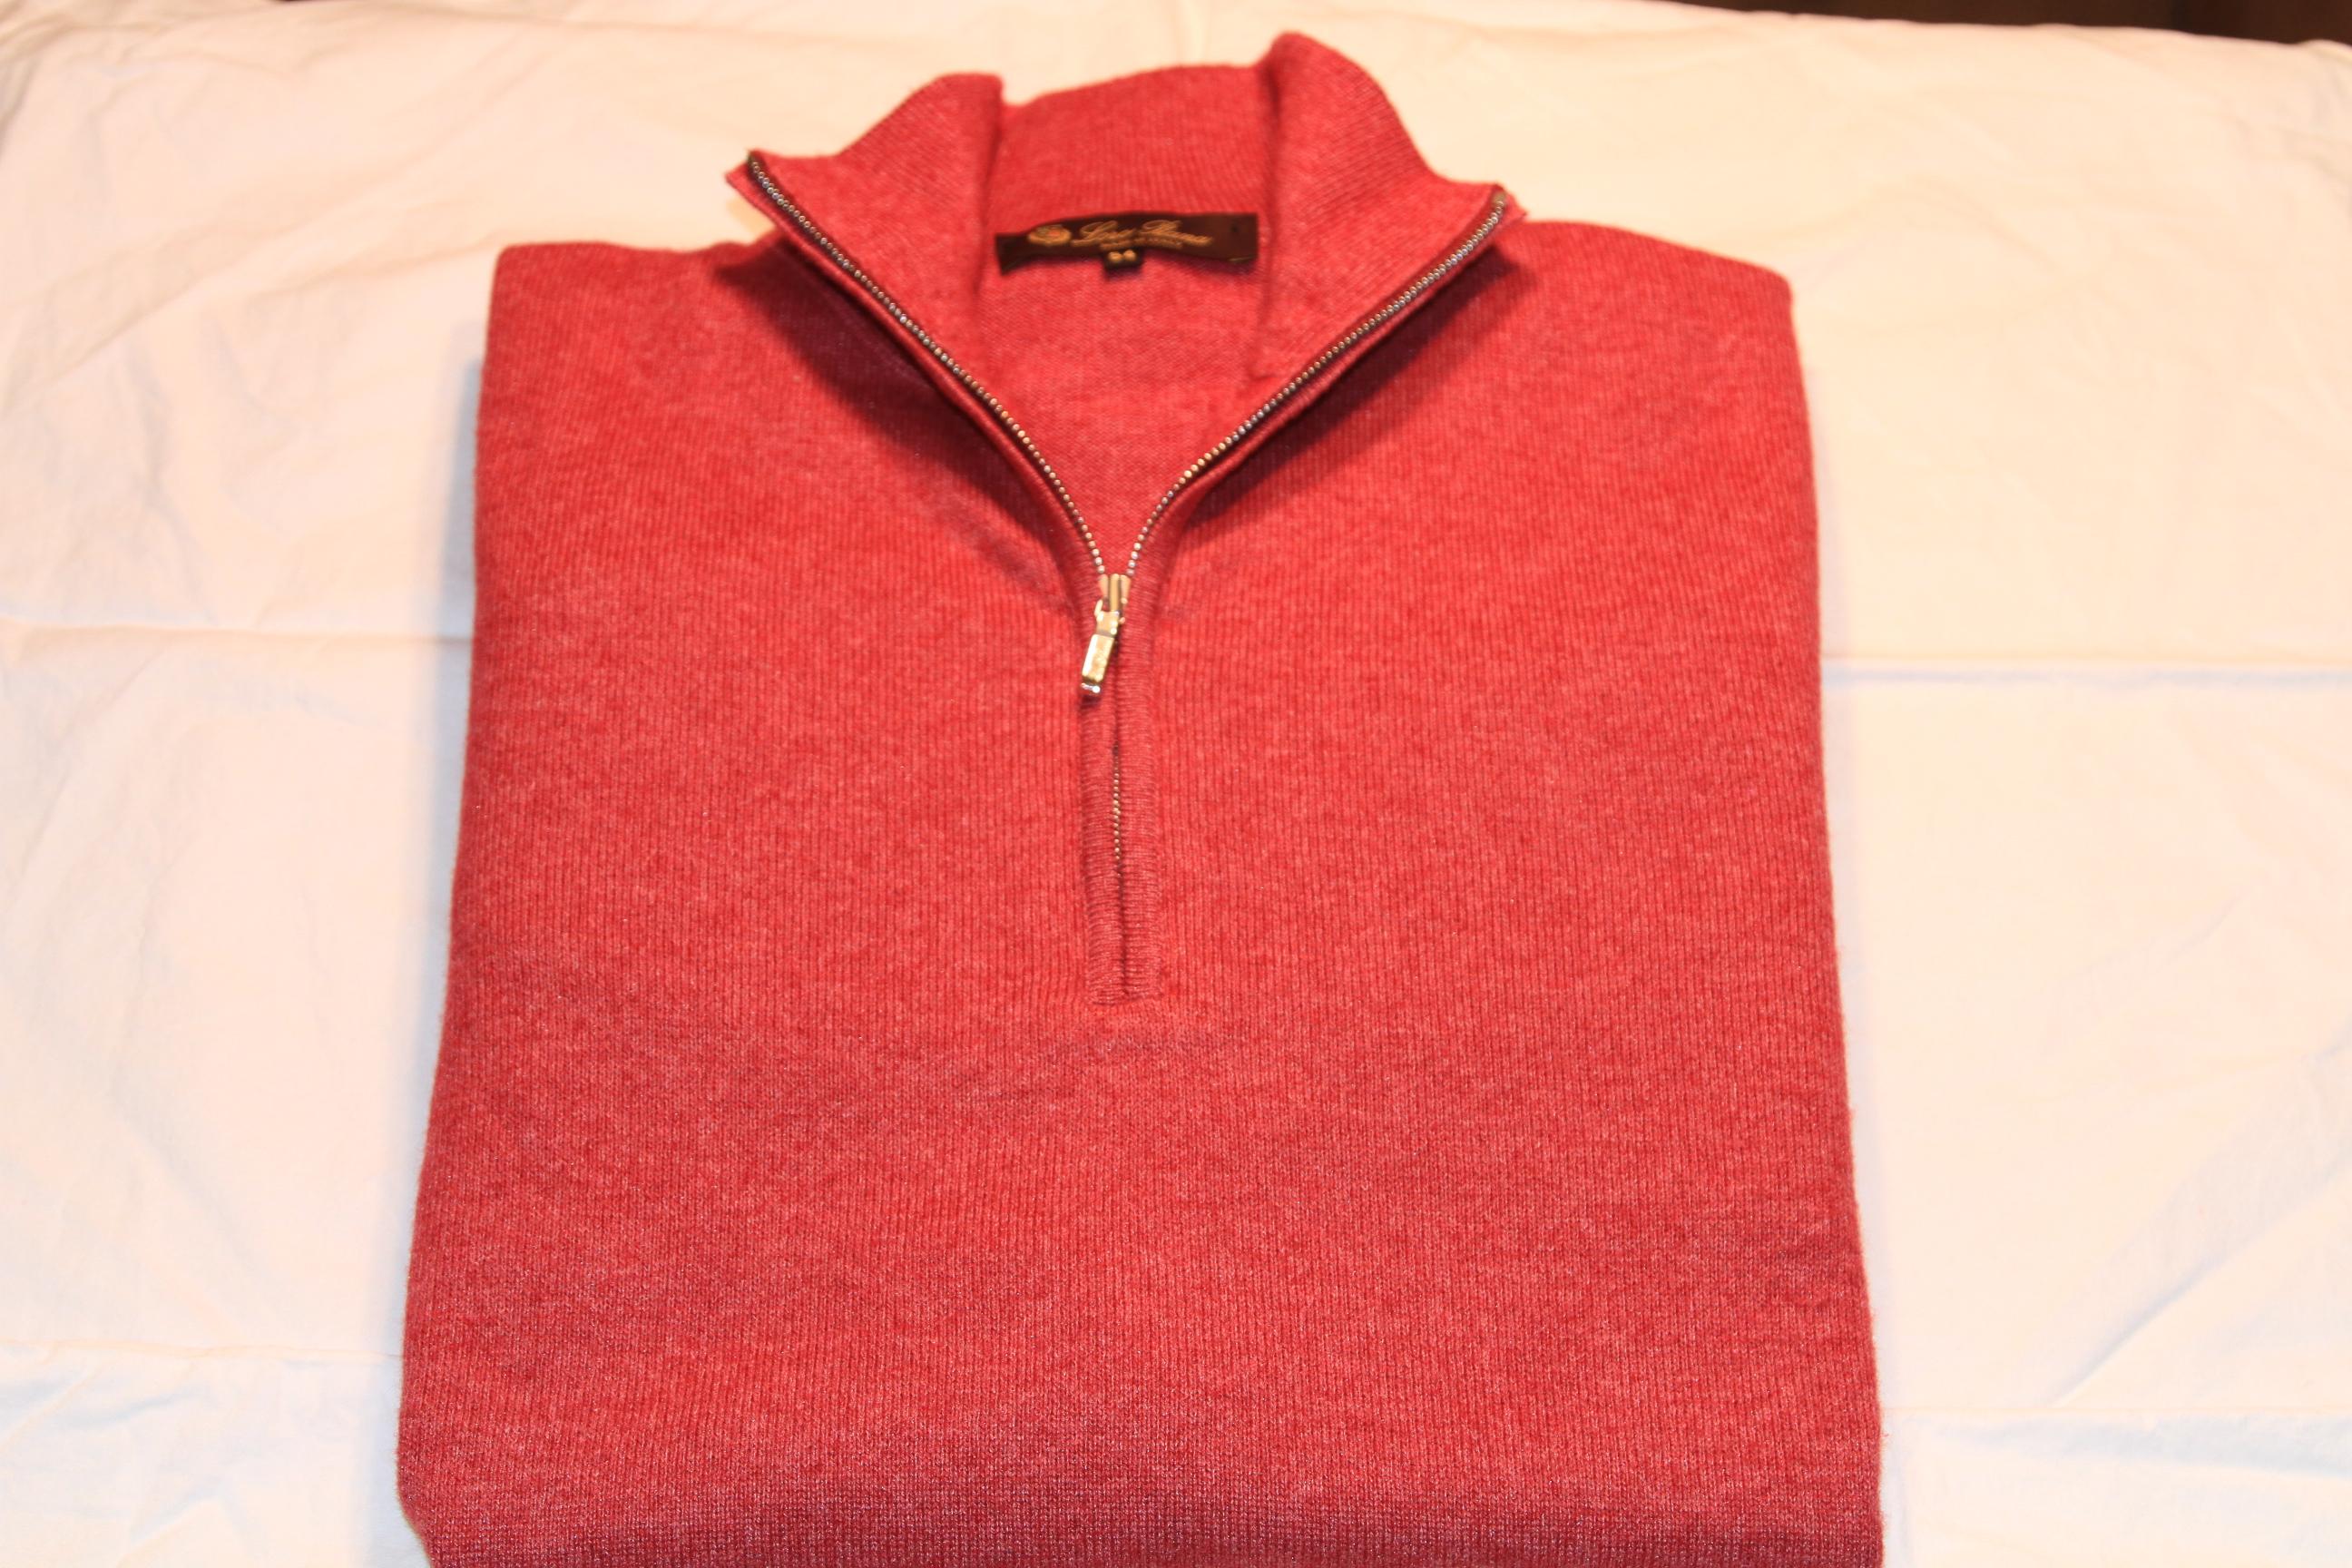 #4 - Lora Piana Sweater Size 54 Magenta Half-Zip 50% Cashmere 50% Silk Elbow Pads Amazing, Amazing Sweater $275